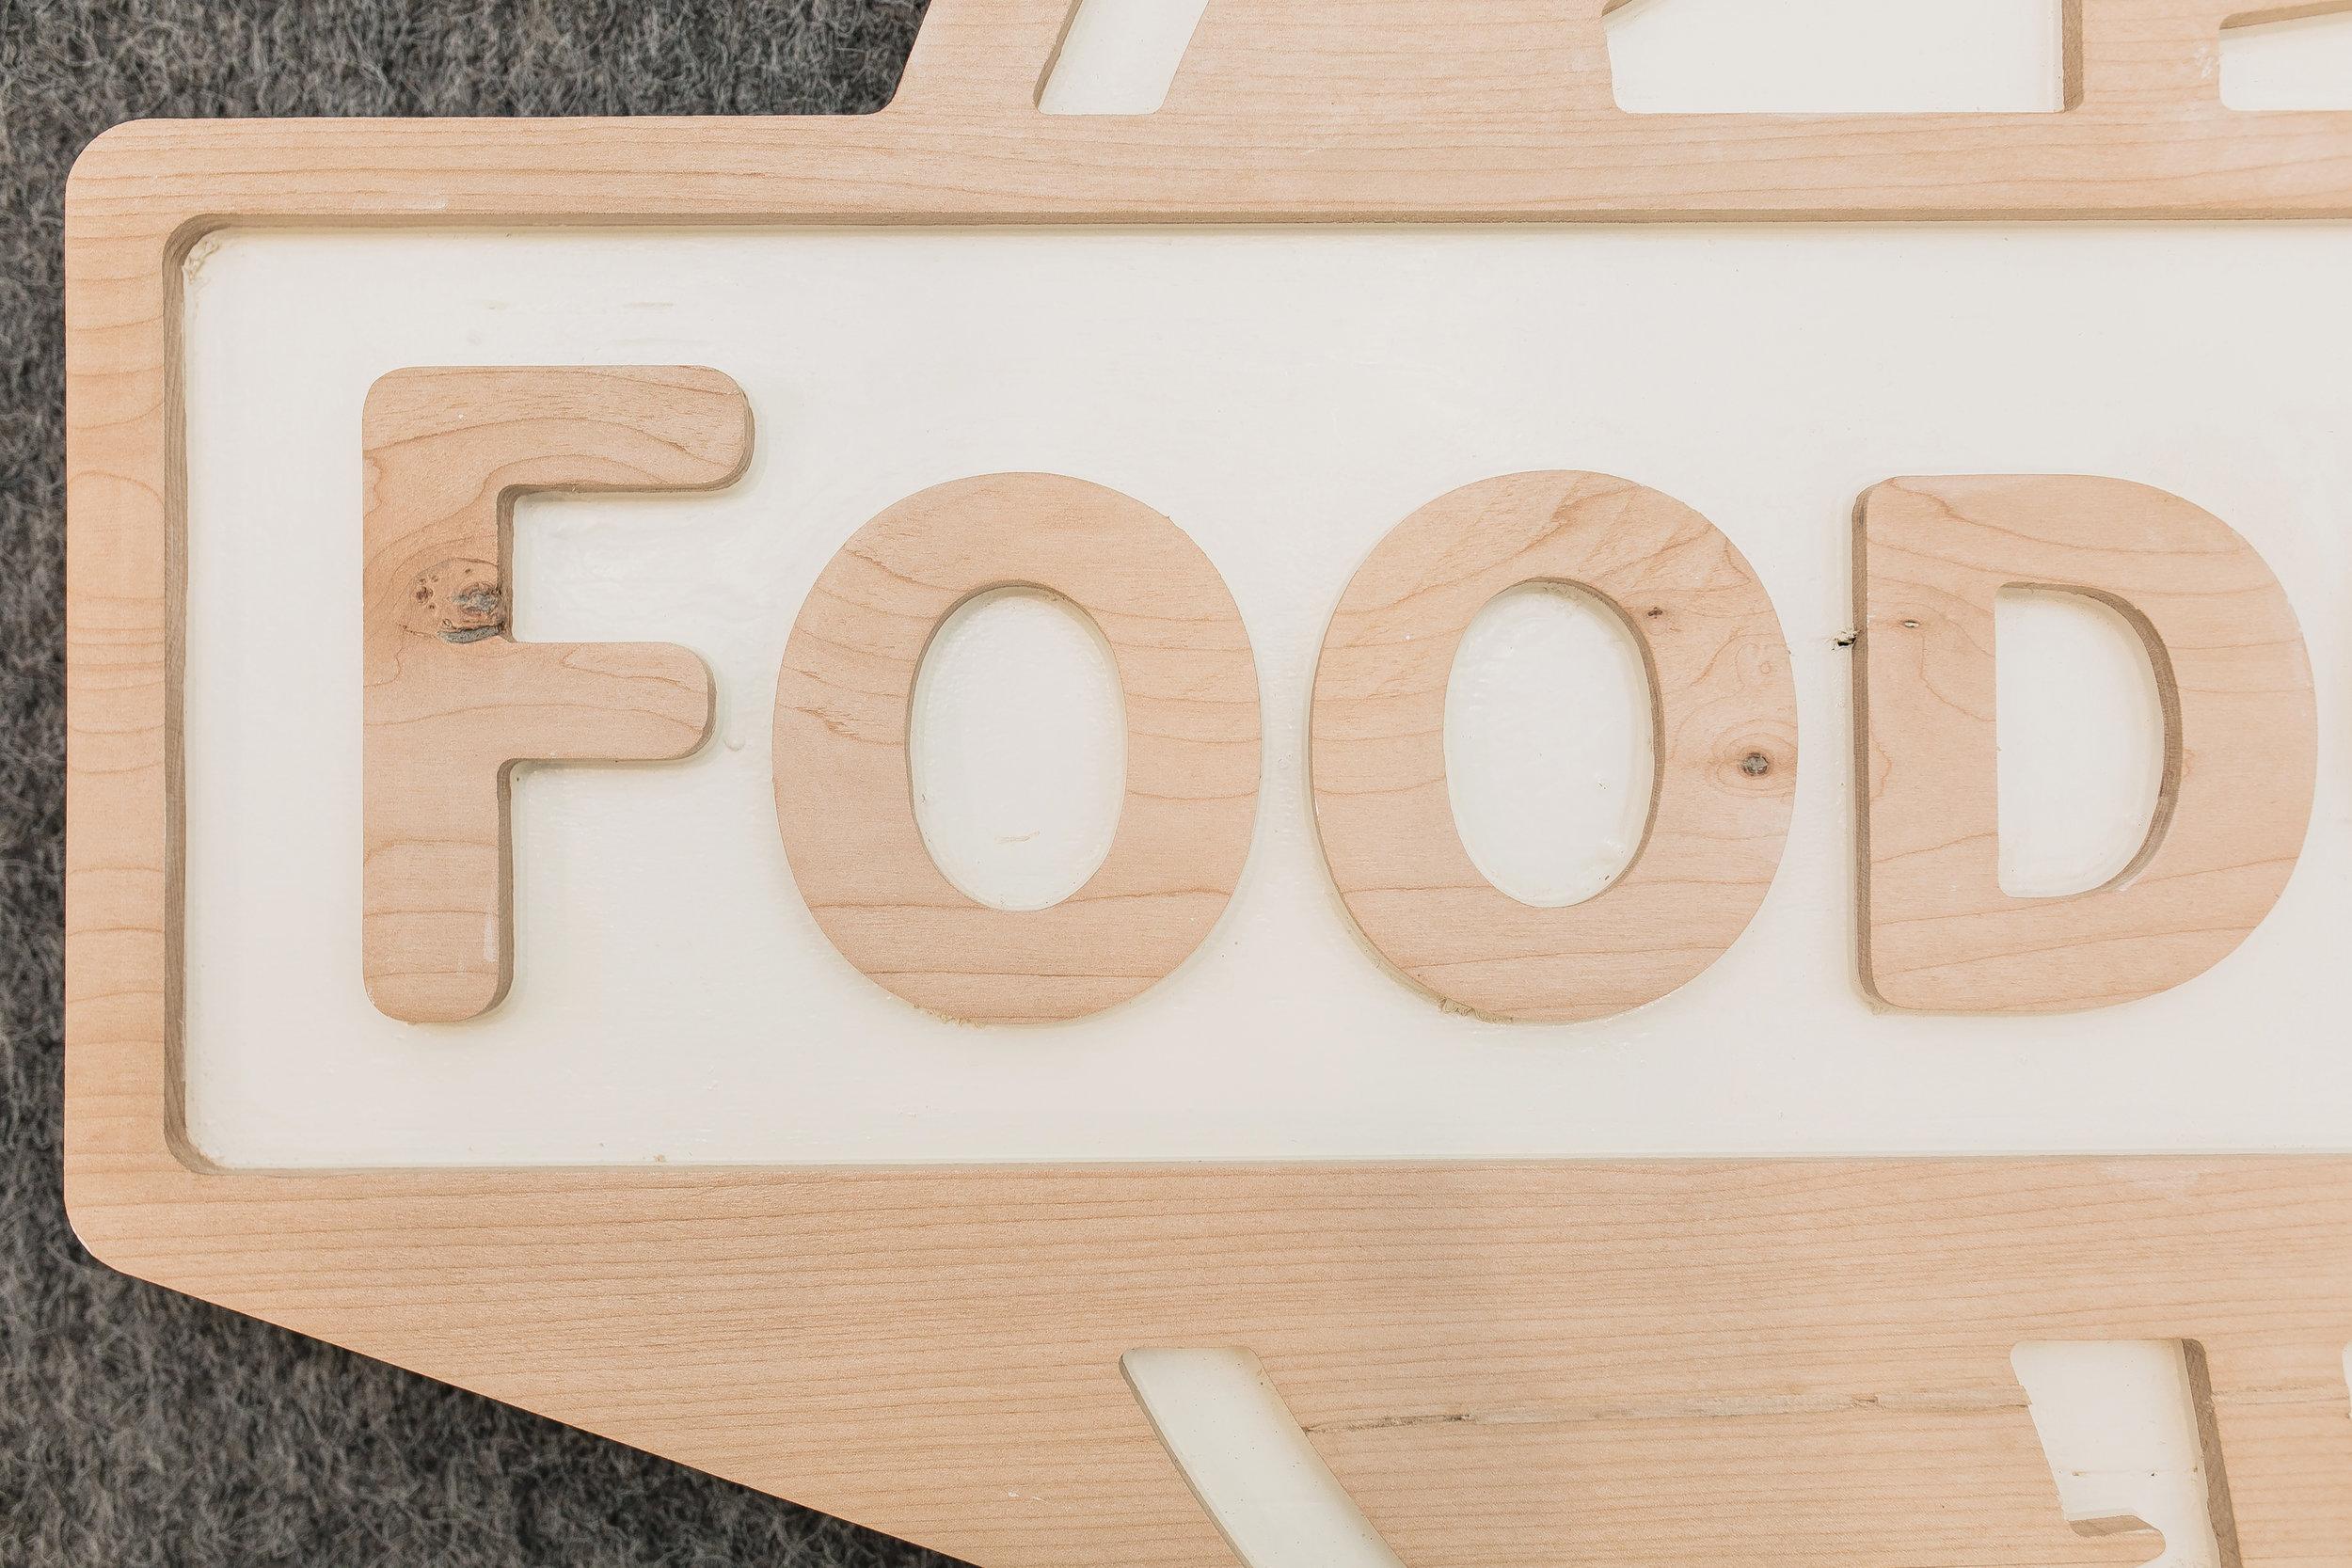 ACT_FoodCorps_ (10).jpg